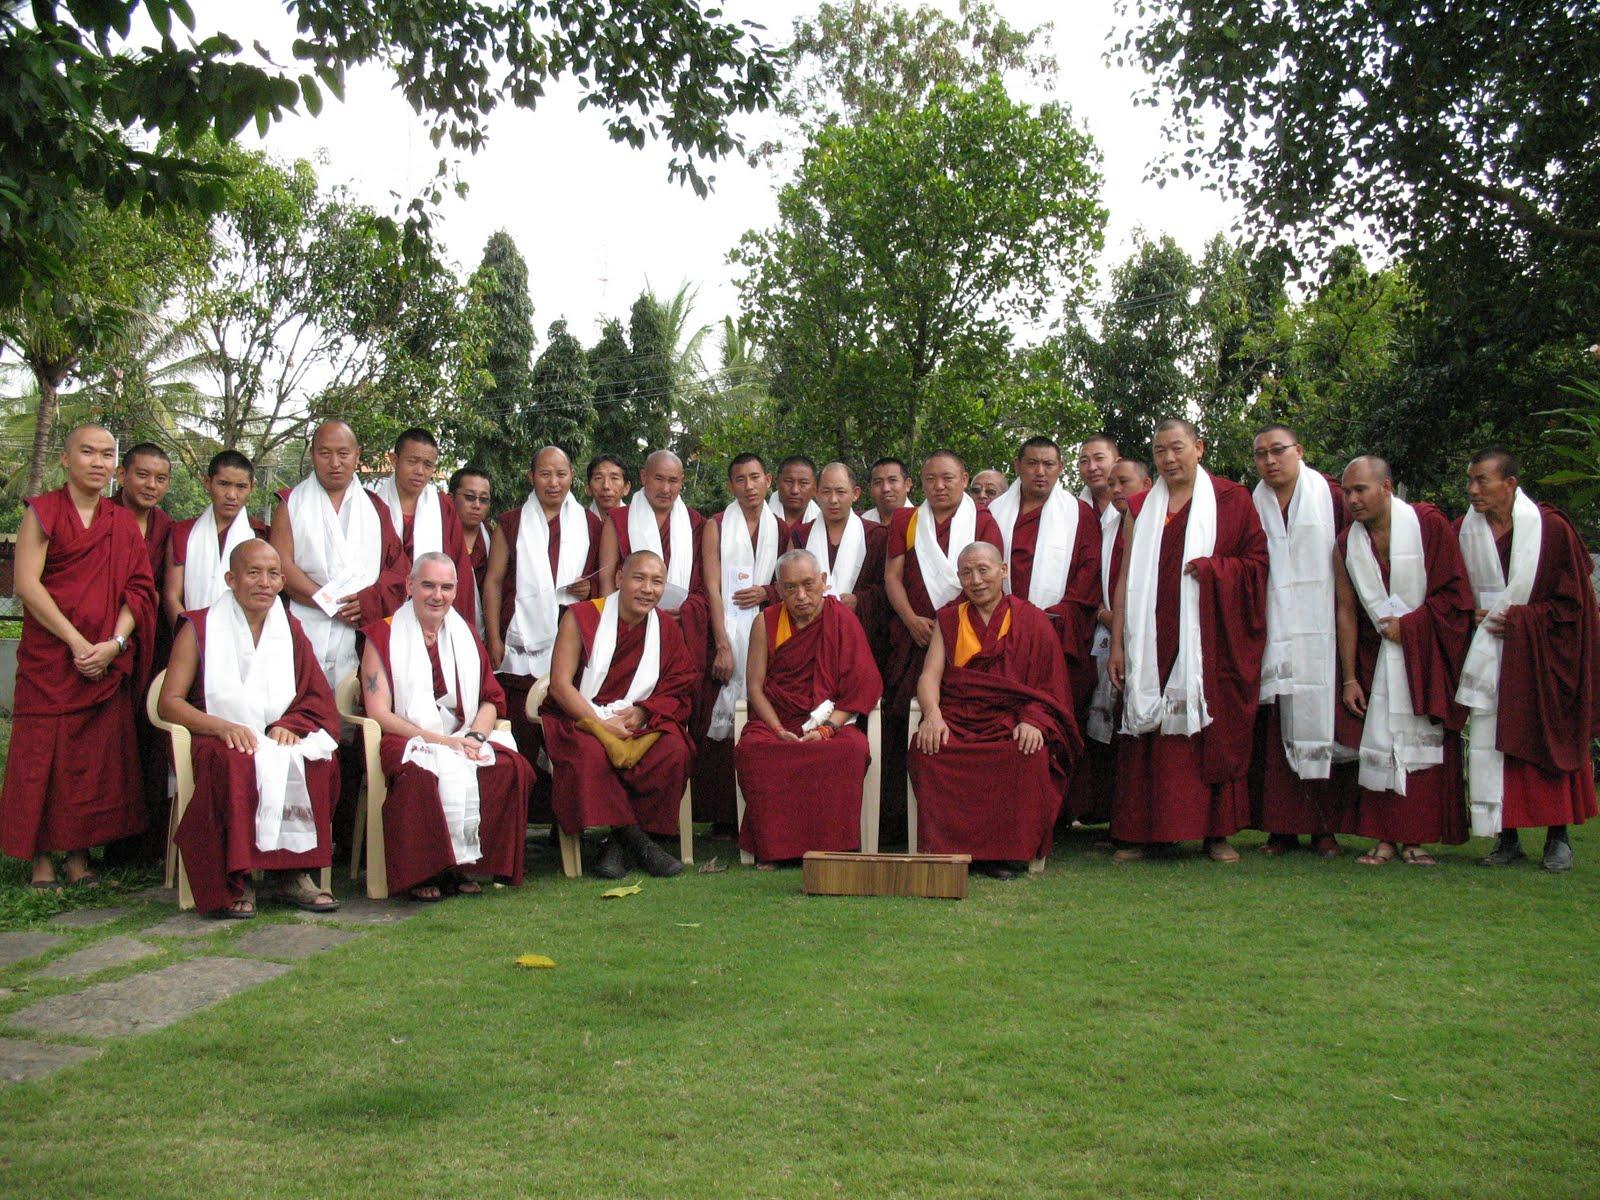 Lama Zopa Rinpoche, Abbott of Sera Je Monastery, Ven. Roger Kunsang and the monks of Sera Je Monastery